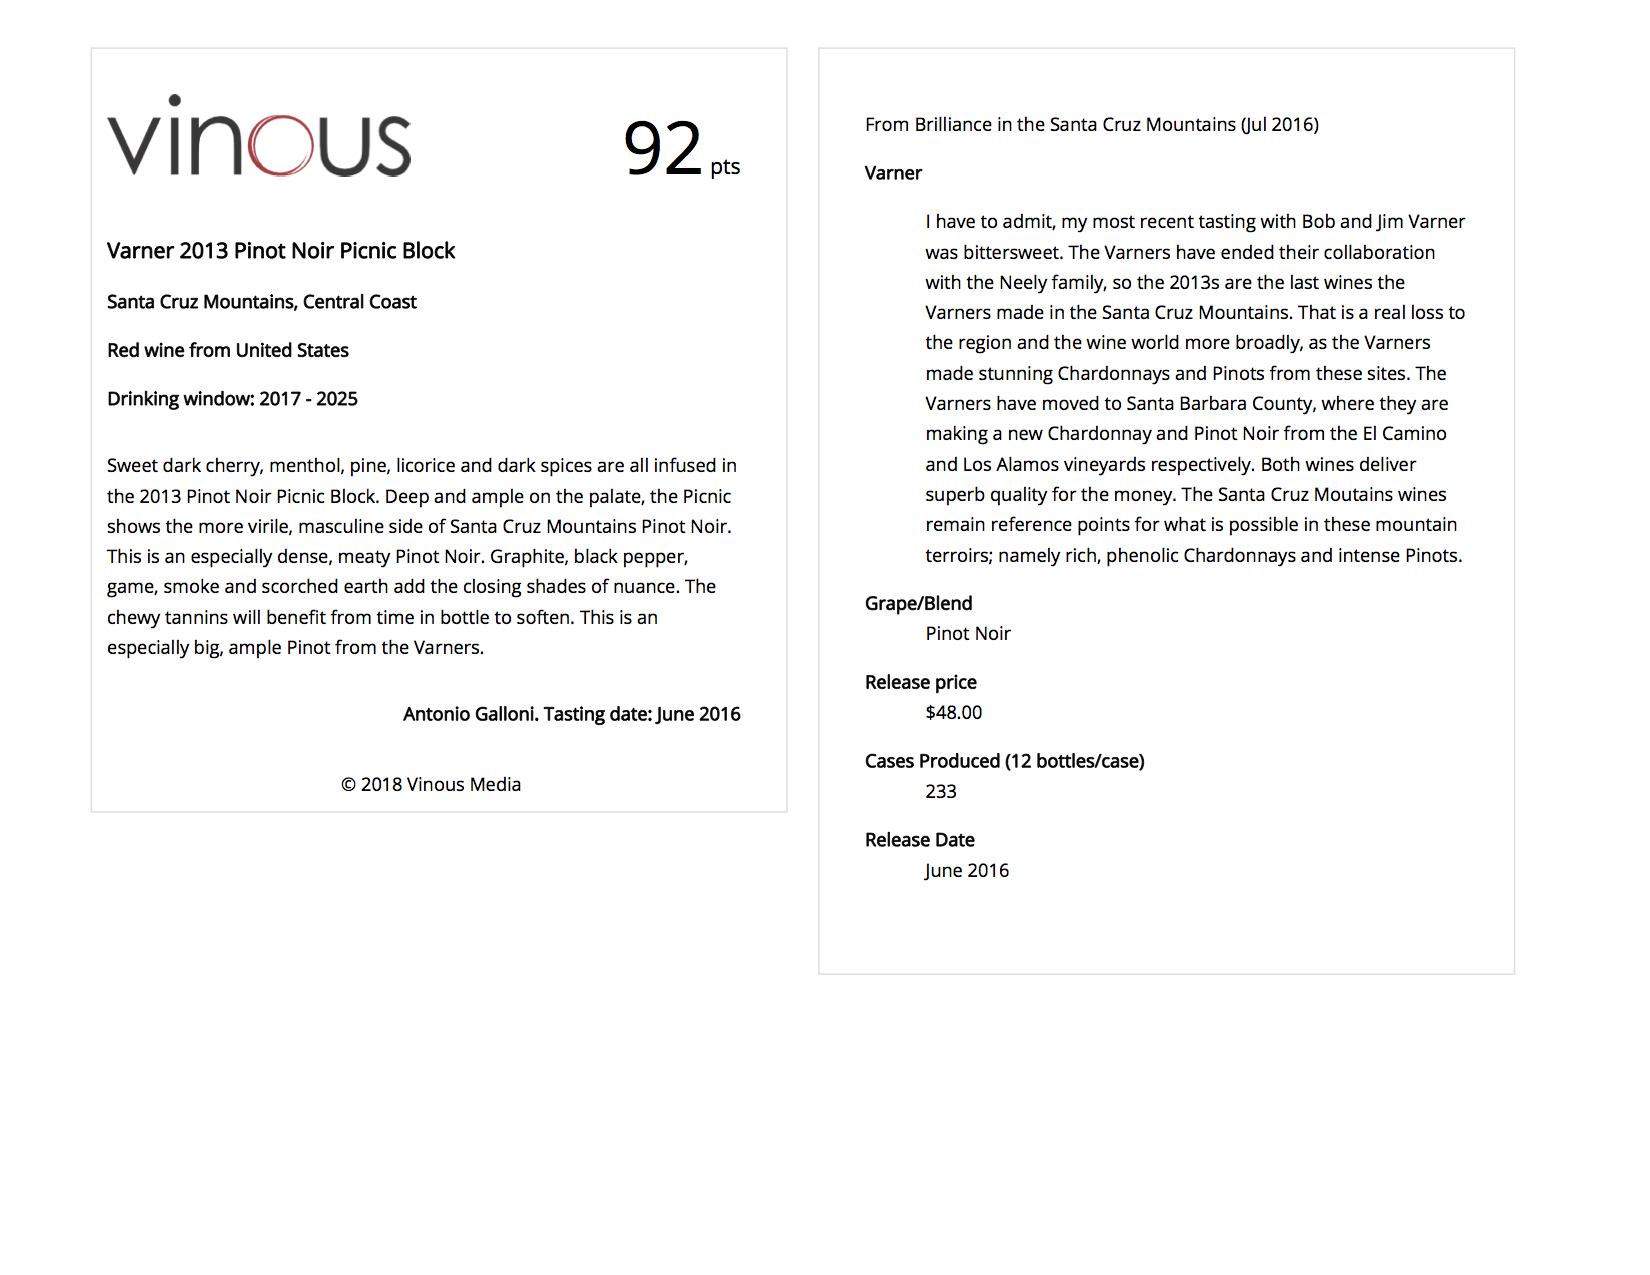 2013 Picnic Block Vinous.jpg